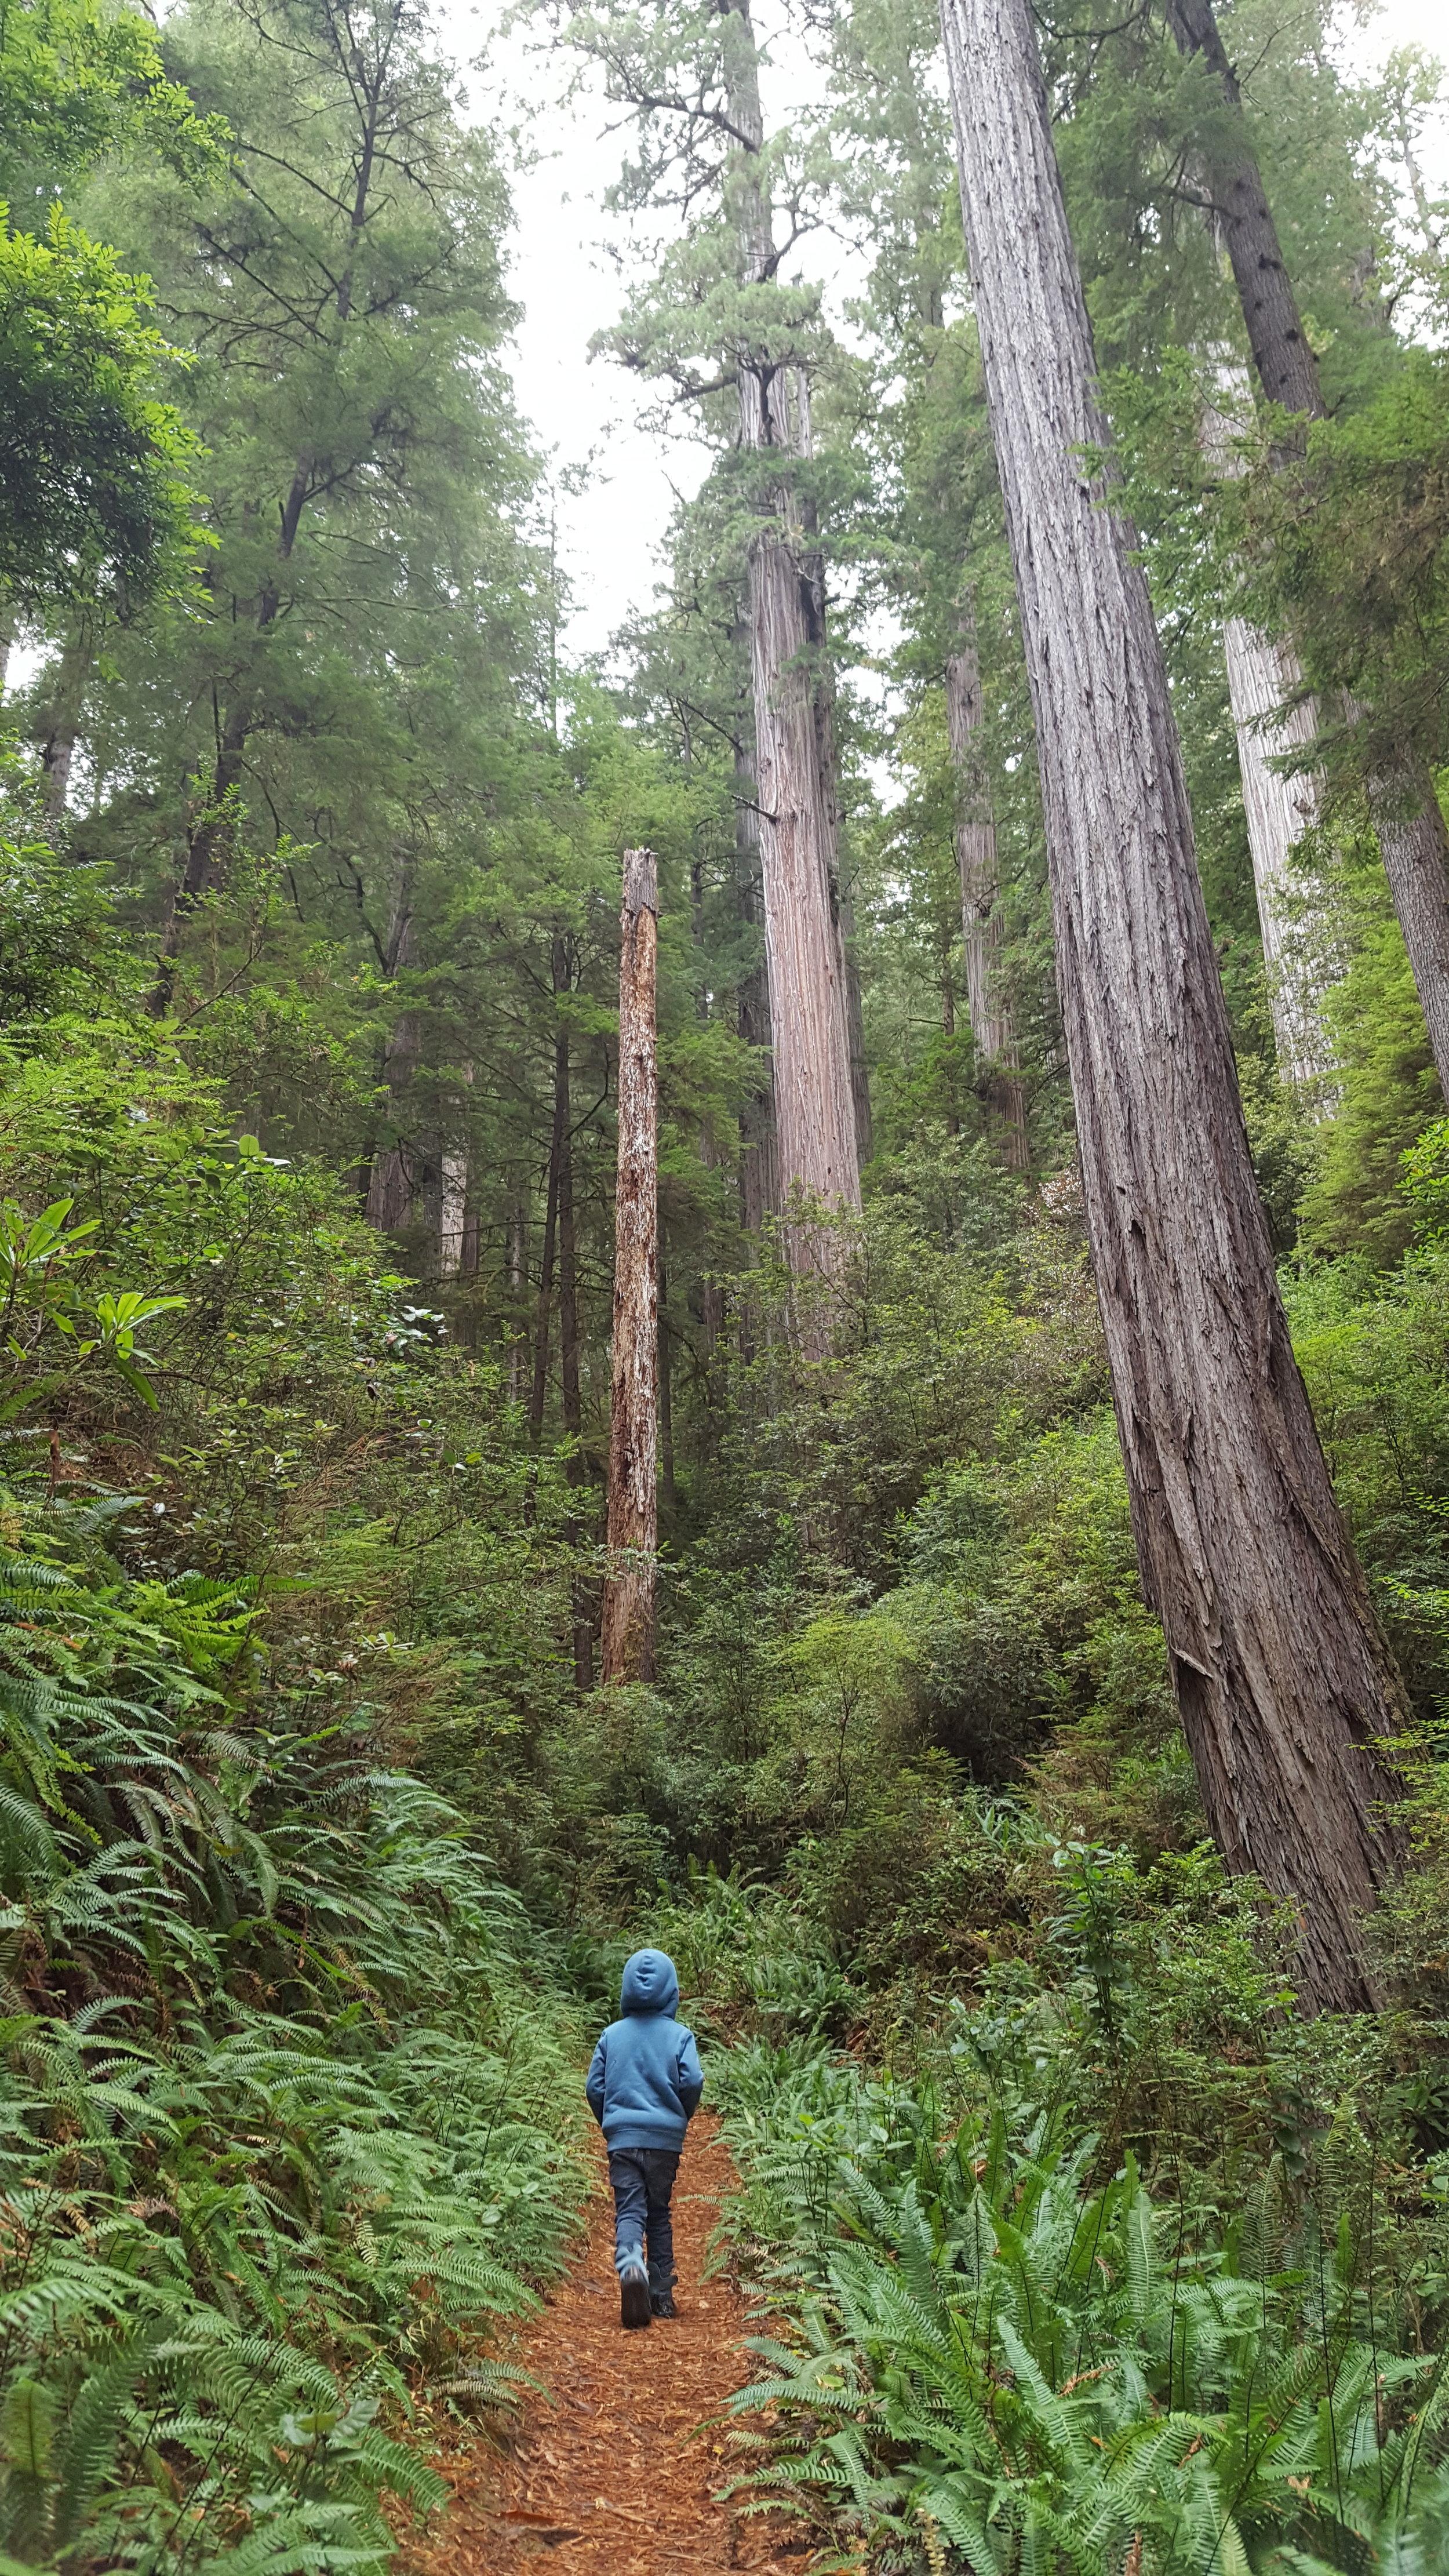 Bennett cruising among some of the smaller (but tall!) redwoods.